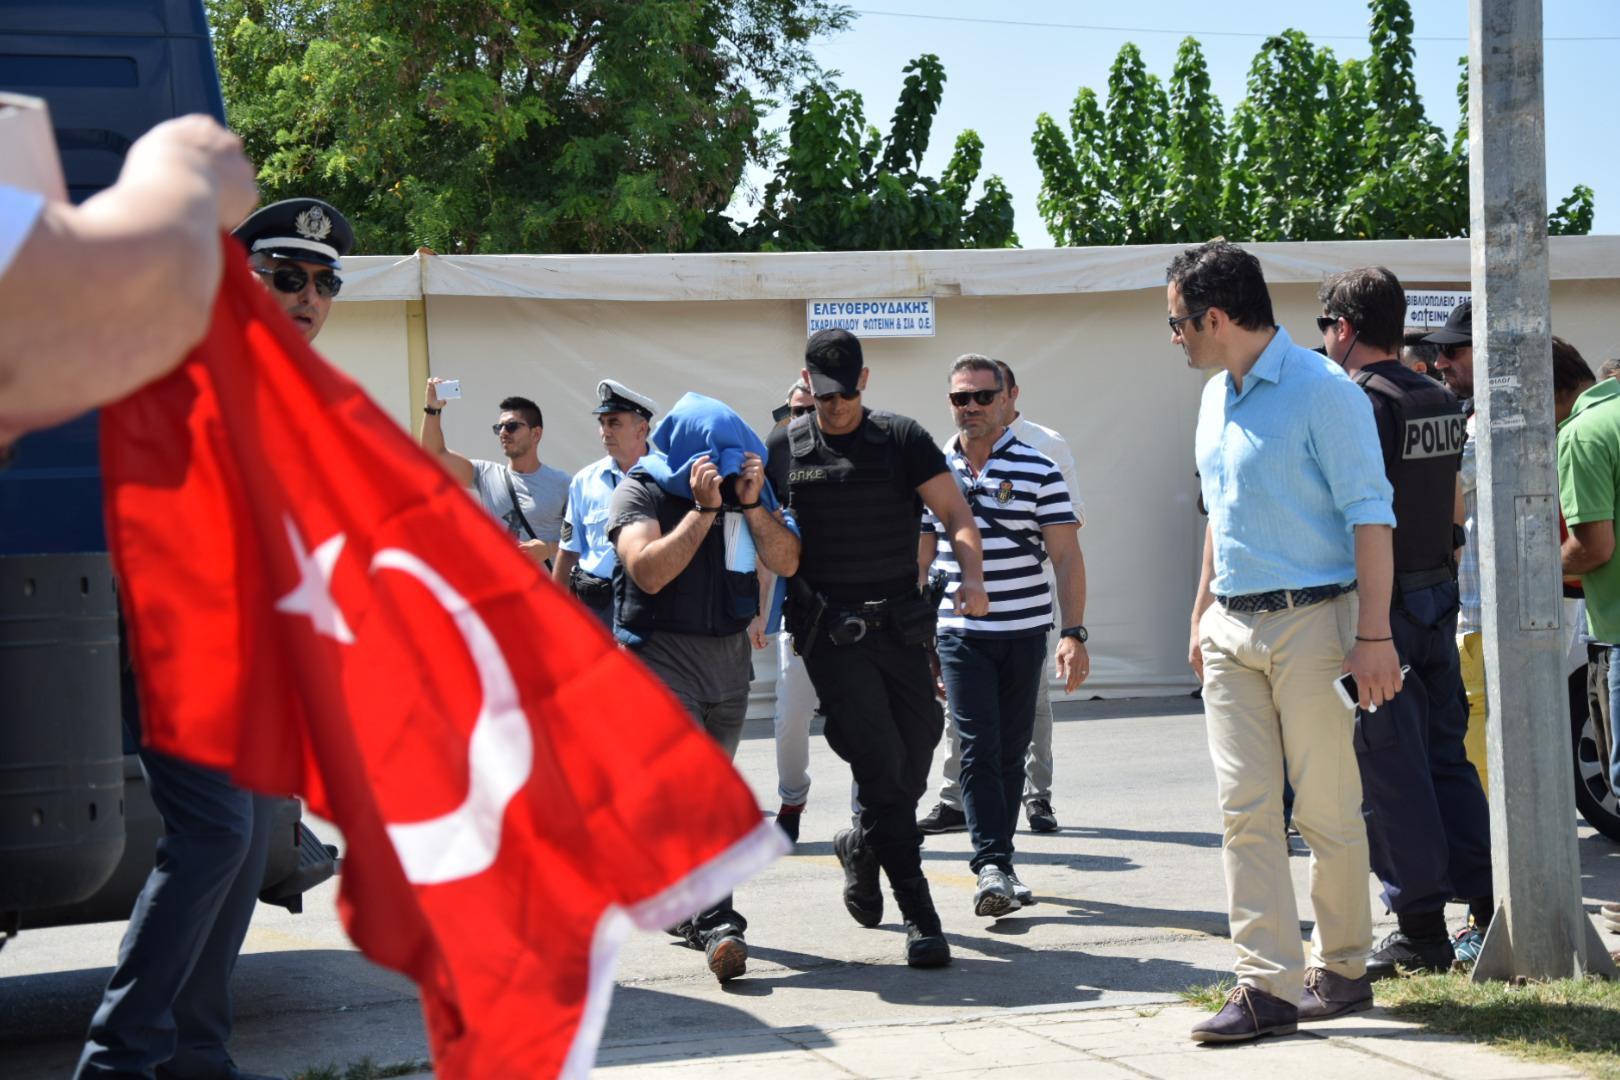 tourkoi-8-anakritis4-1000 Στο δικαστήριο οι 8 Tούρκοι στρατιώτες – Ένταση με διάσημη τρανσέξουναλ από την Τουρκία [εικόνες]